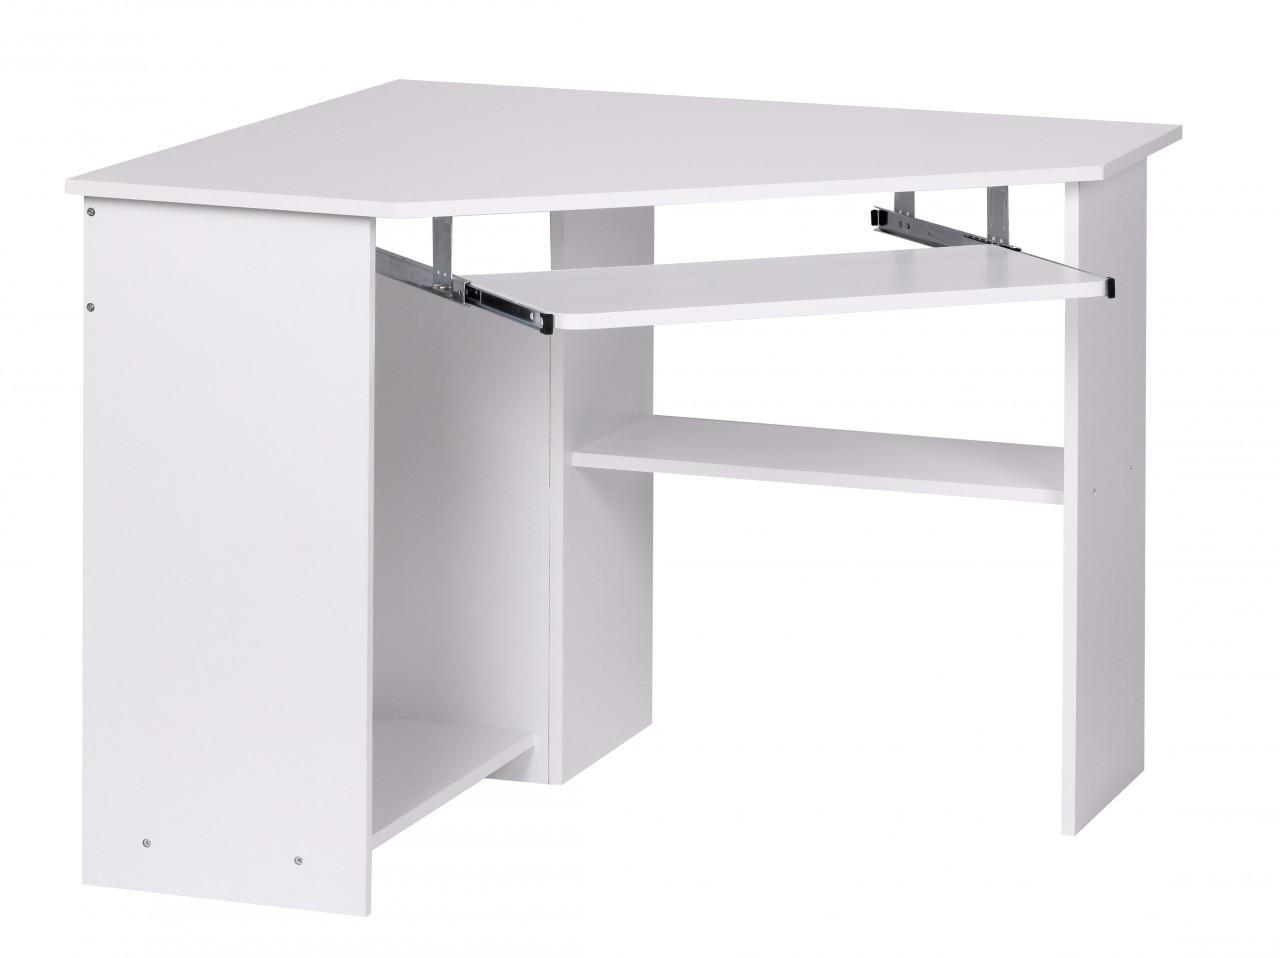 preisvergleich eu eckschreibtisch weiss. Black Bedroom Furniture Sets. Home Design Ideas